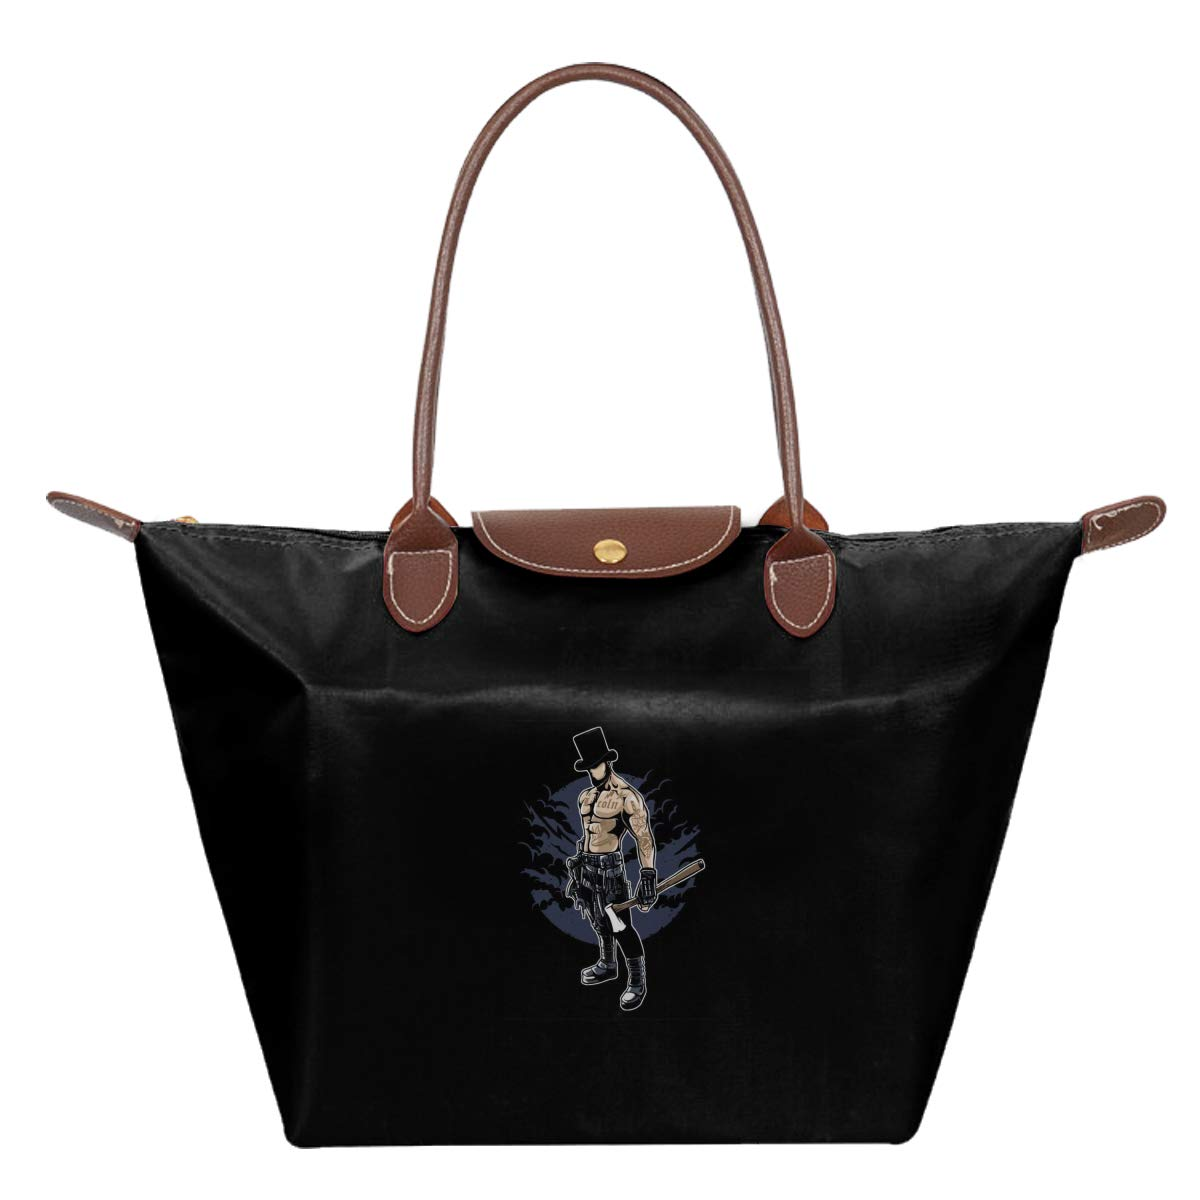 Abraham Lincoln Tattoo Work Belt Waterproof Leather Folded Messenger Nylon Bag Travel Tote Hopping Folding School Handbags